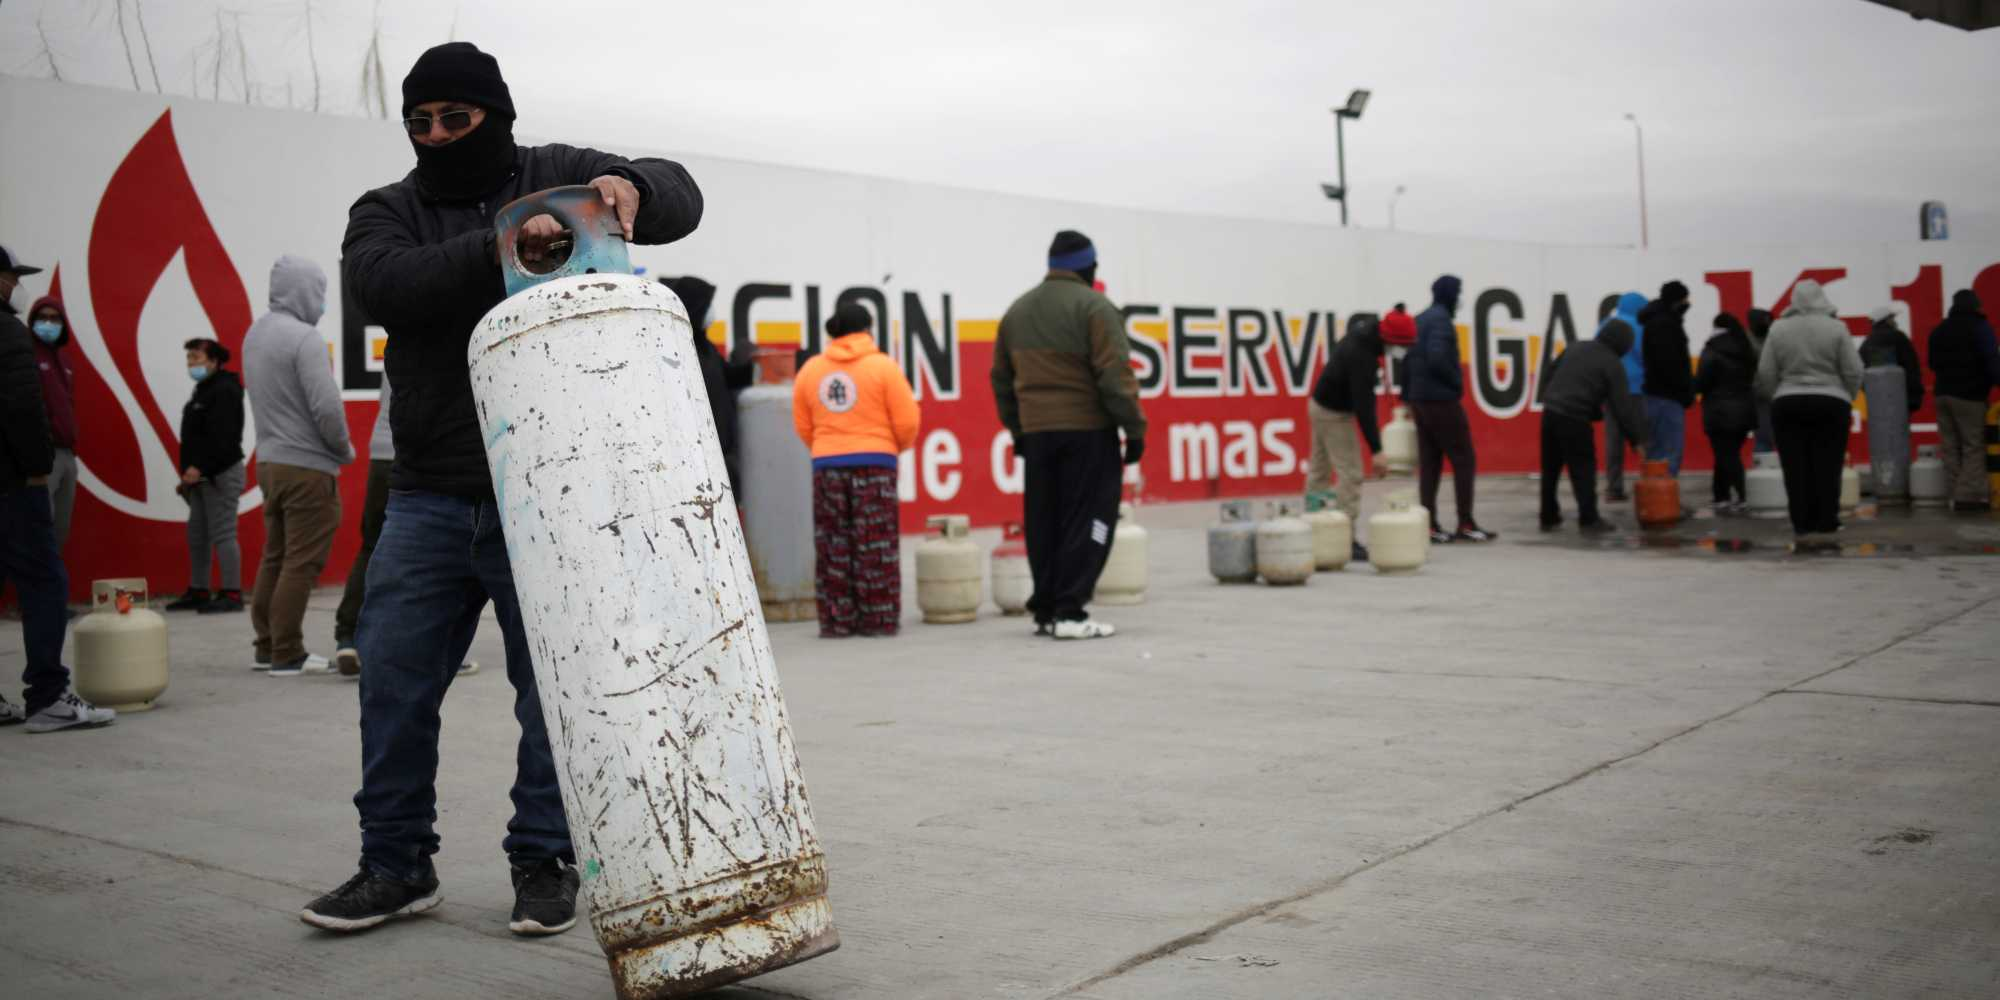 gas_bienestar  Business Insider México